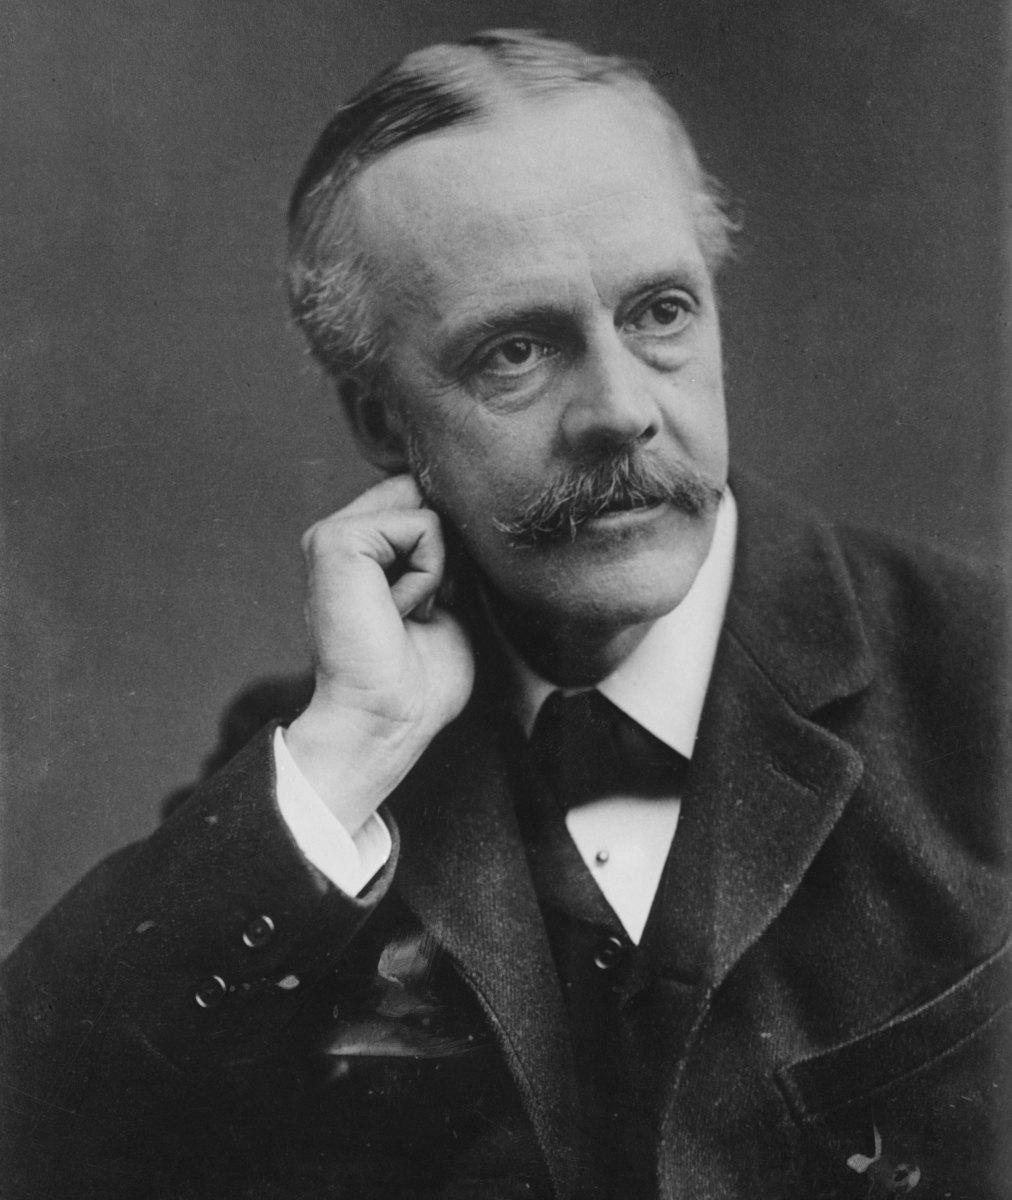 Arthur Balfour. The author of The Balfour Declaration.